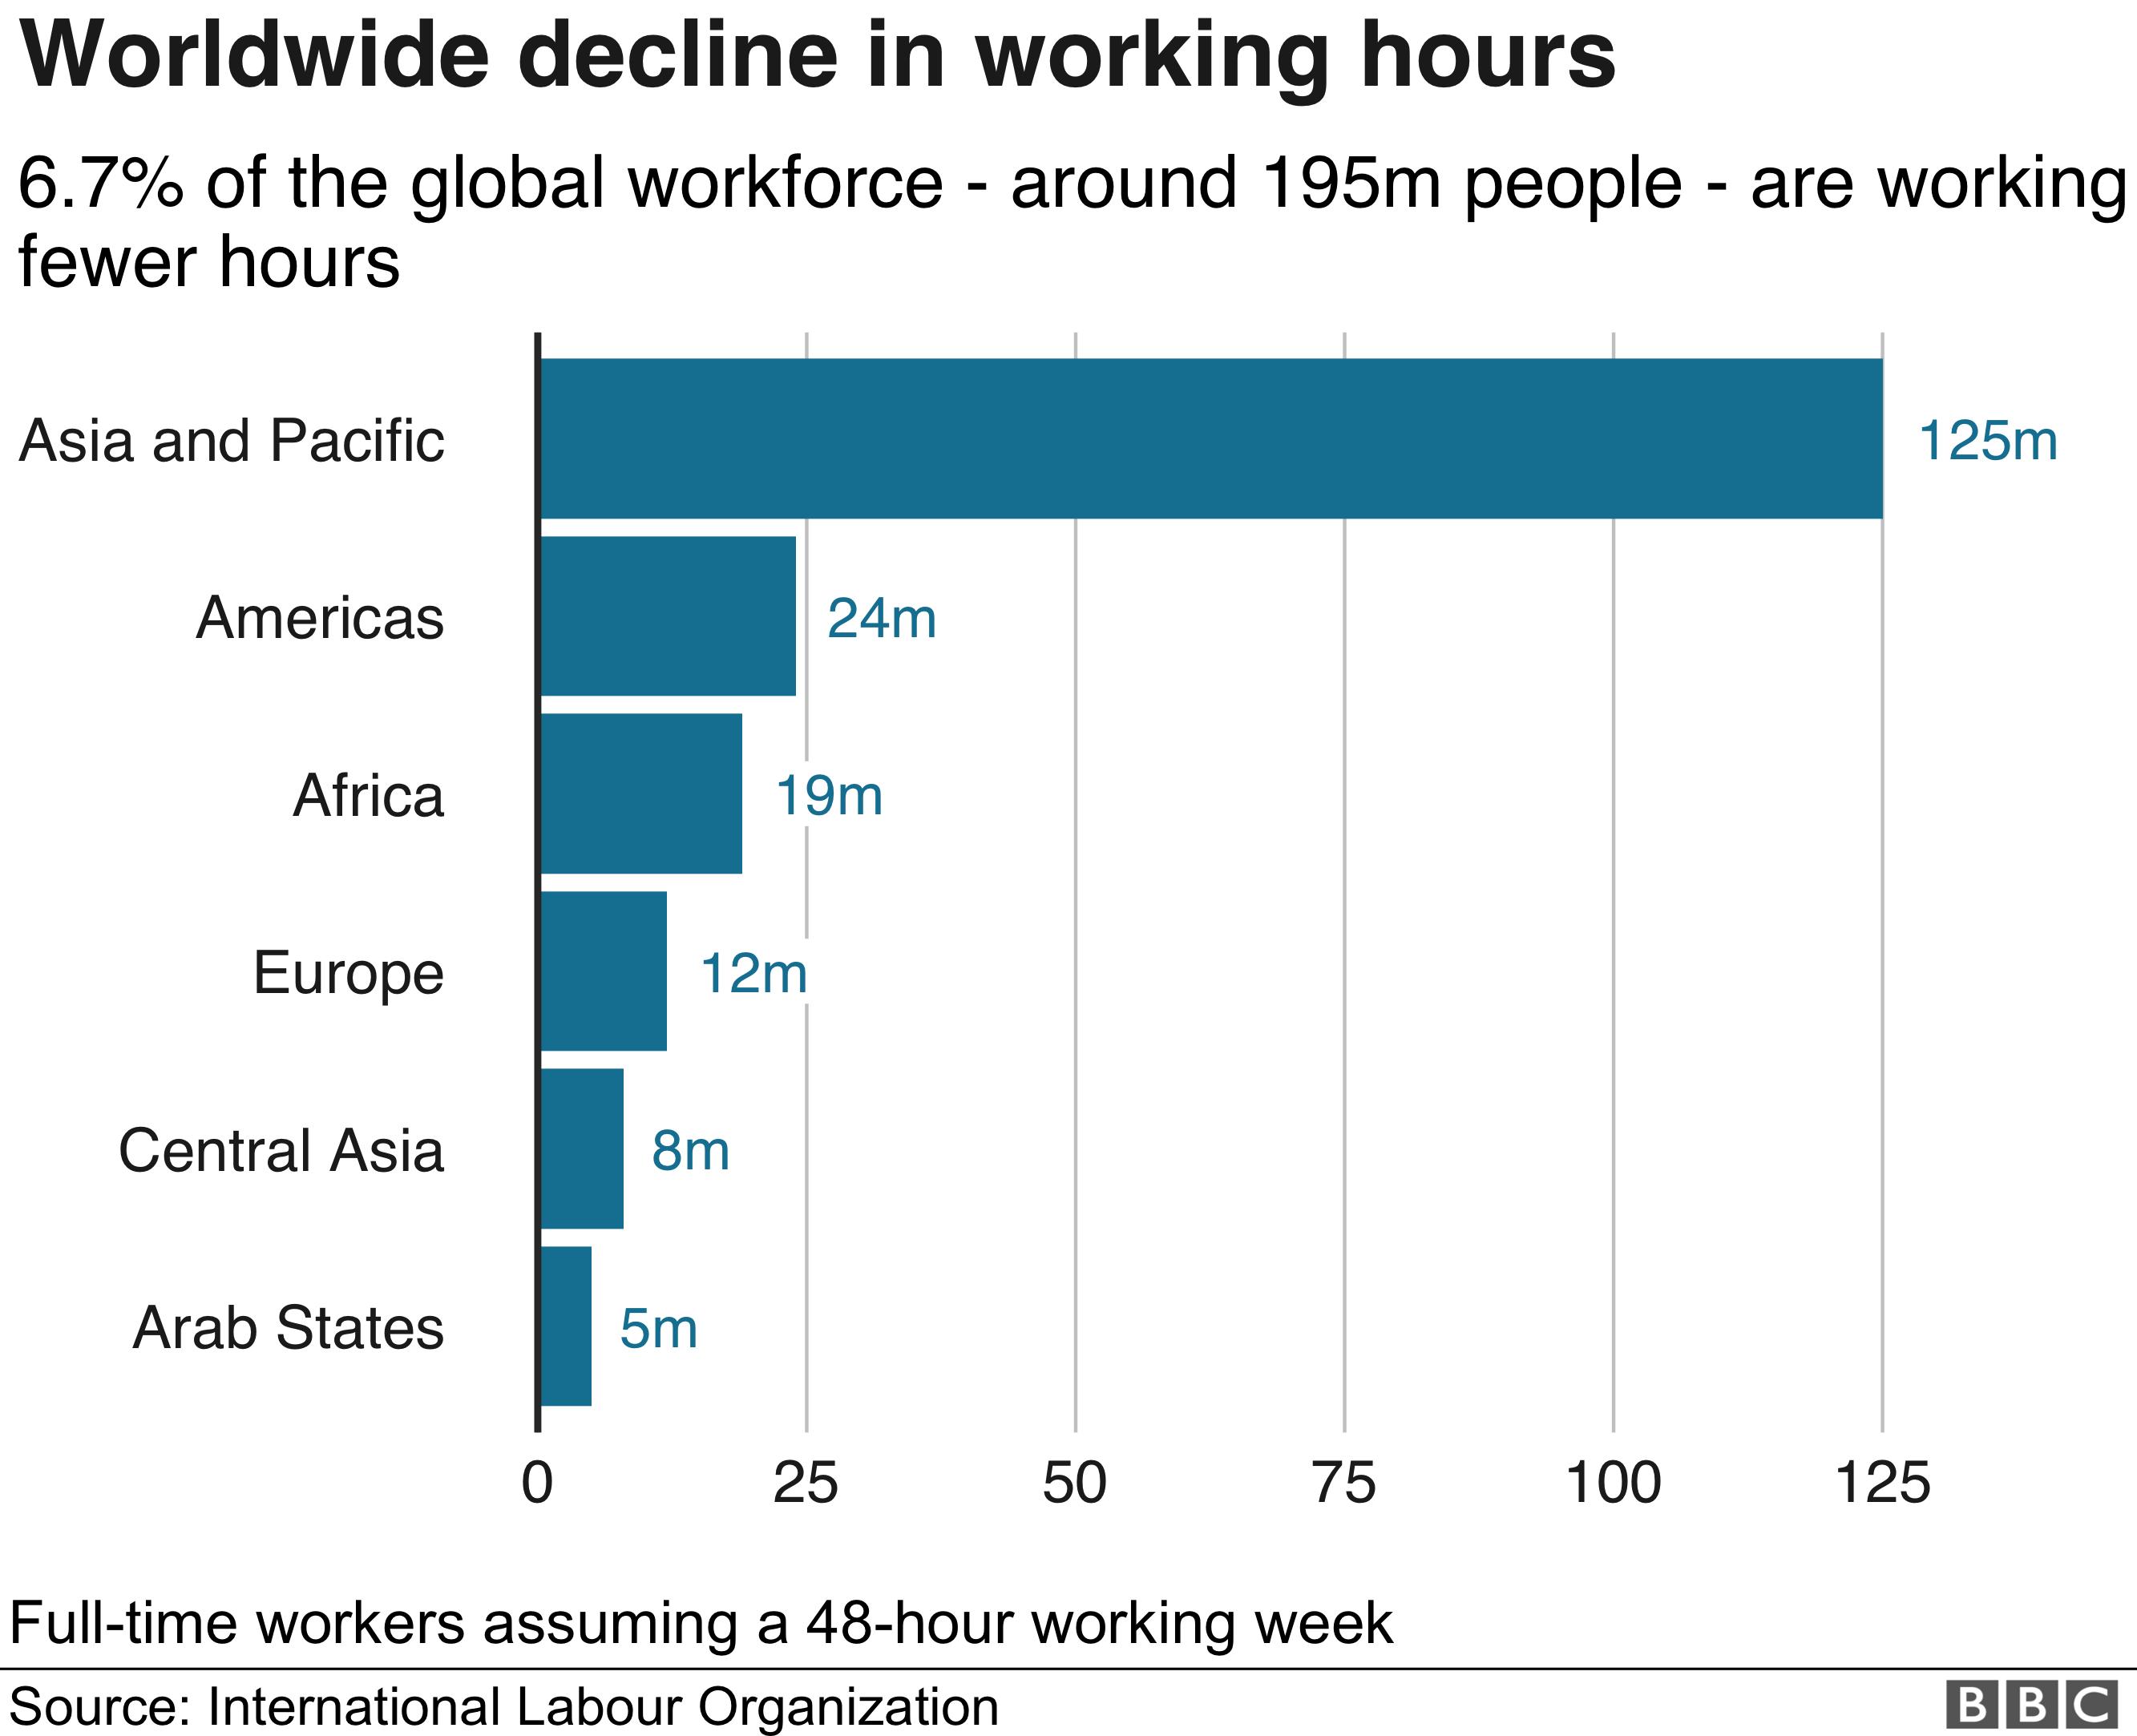 Worldwide decline in working hours bar chart